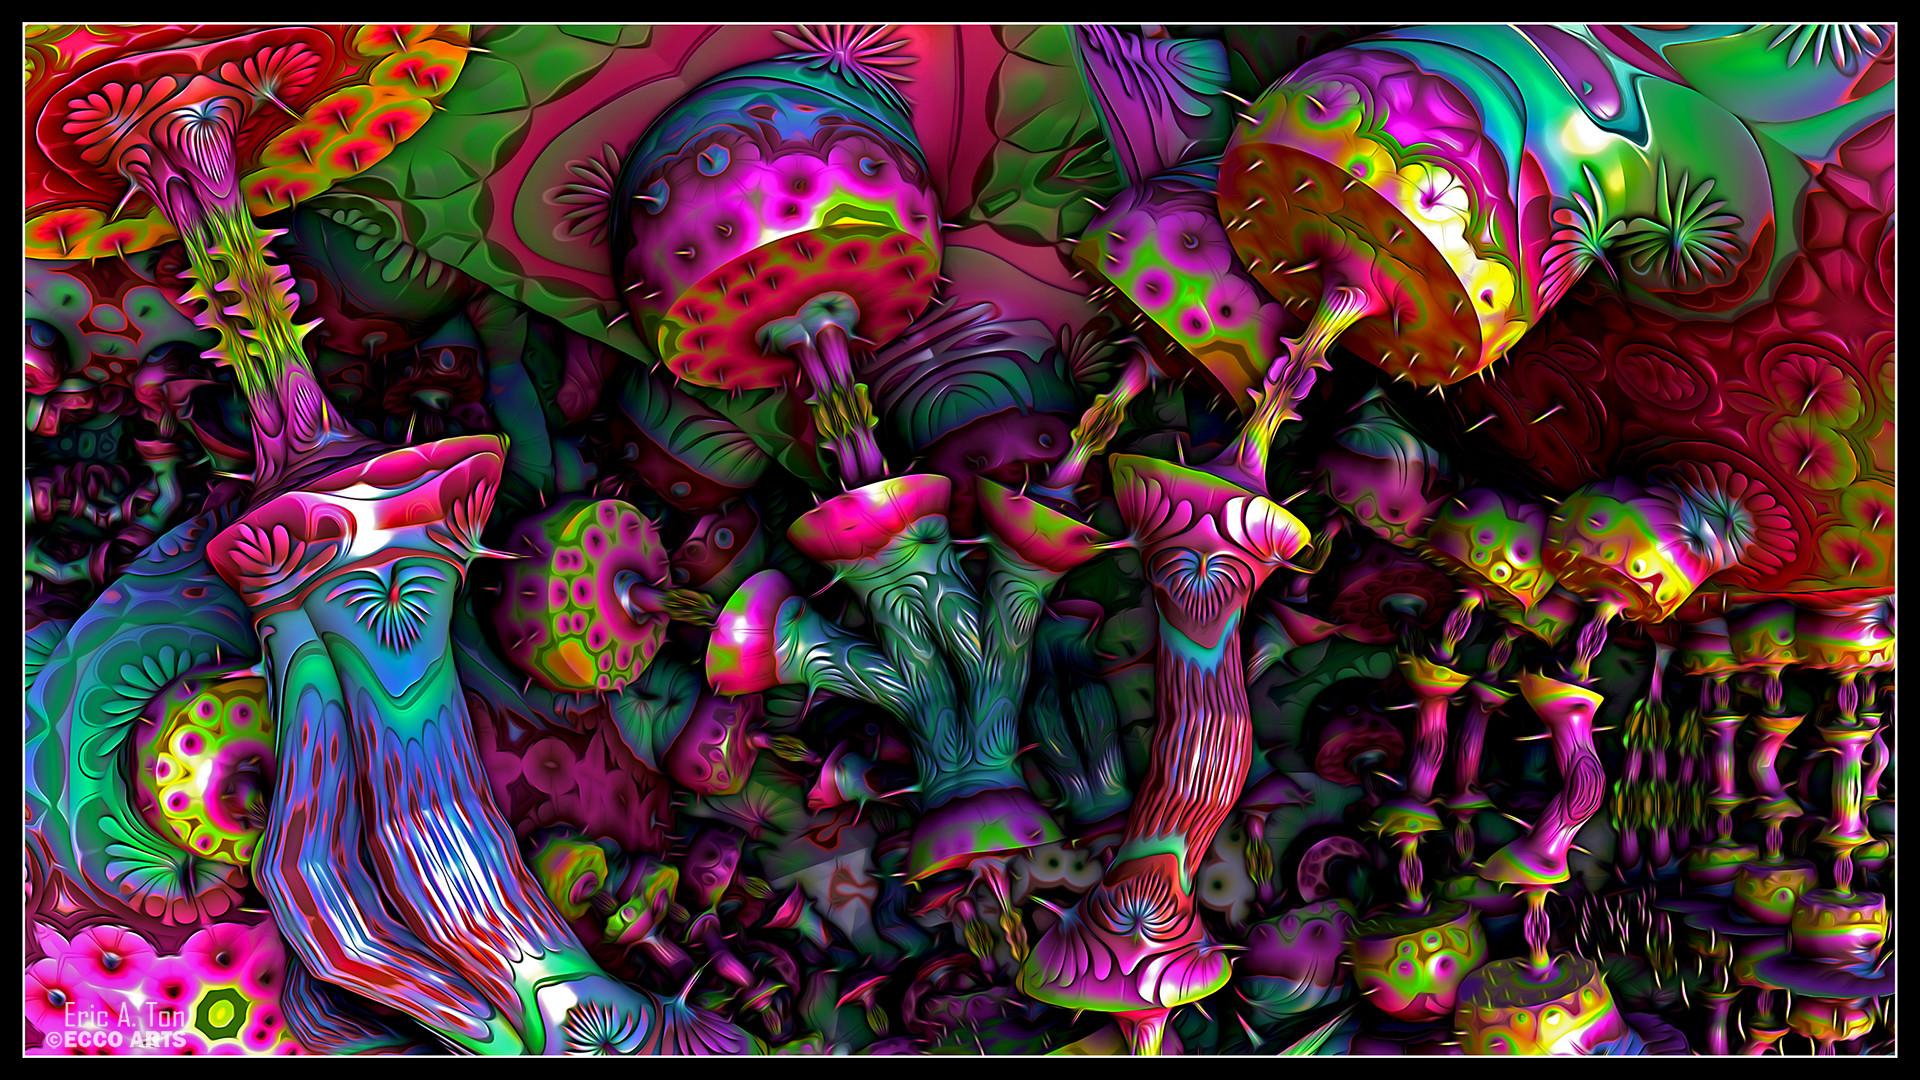 Psychedelic Mushrooms by eccoarts on DeviantArt